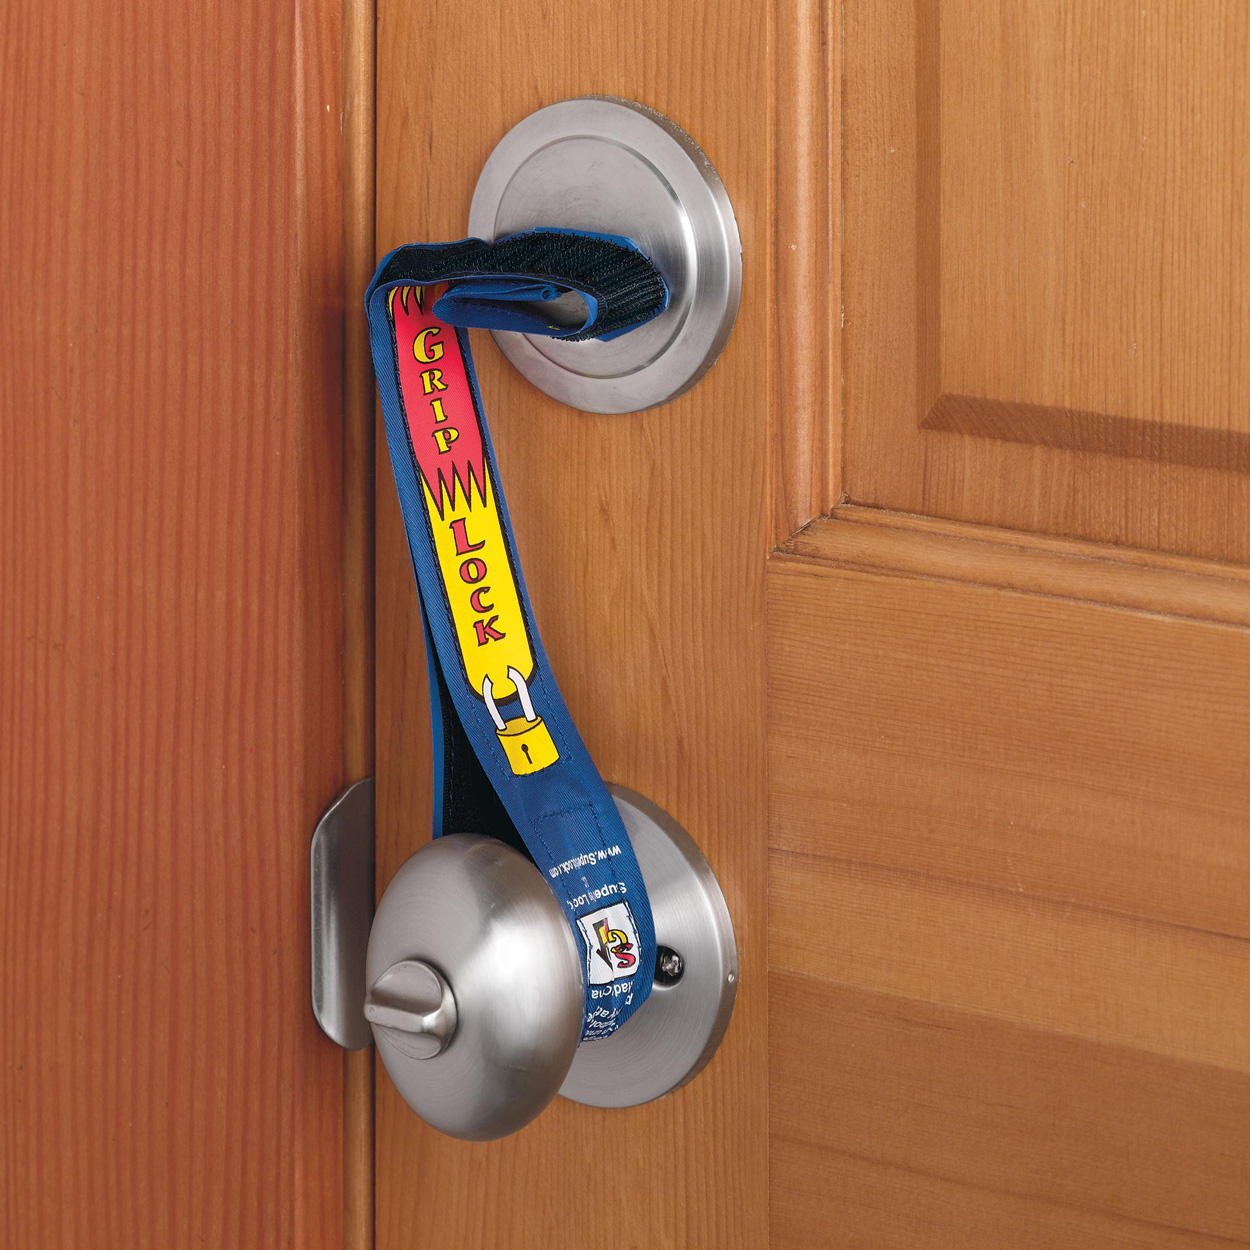 super-grip-lock-deadbolt-security-straps-1